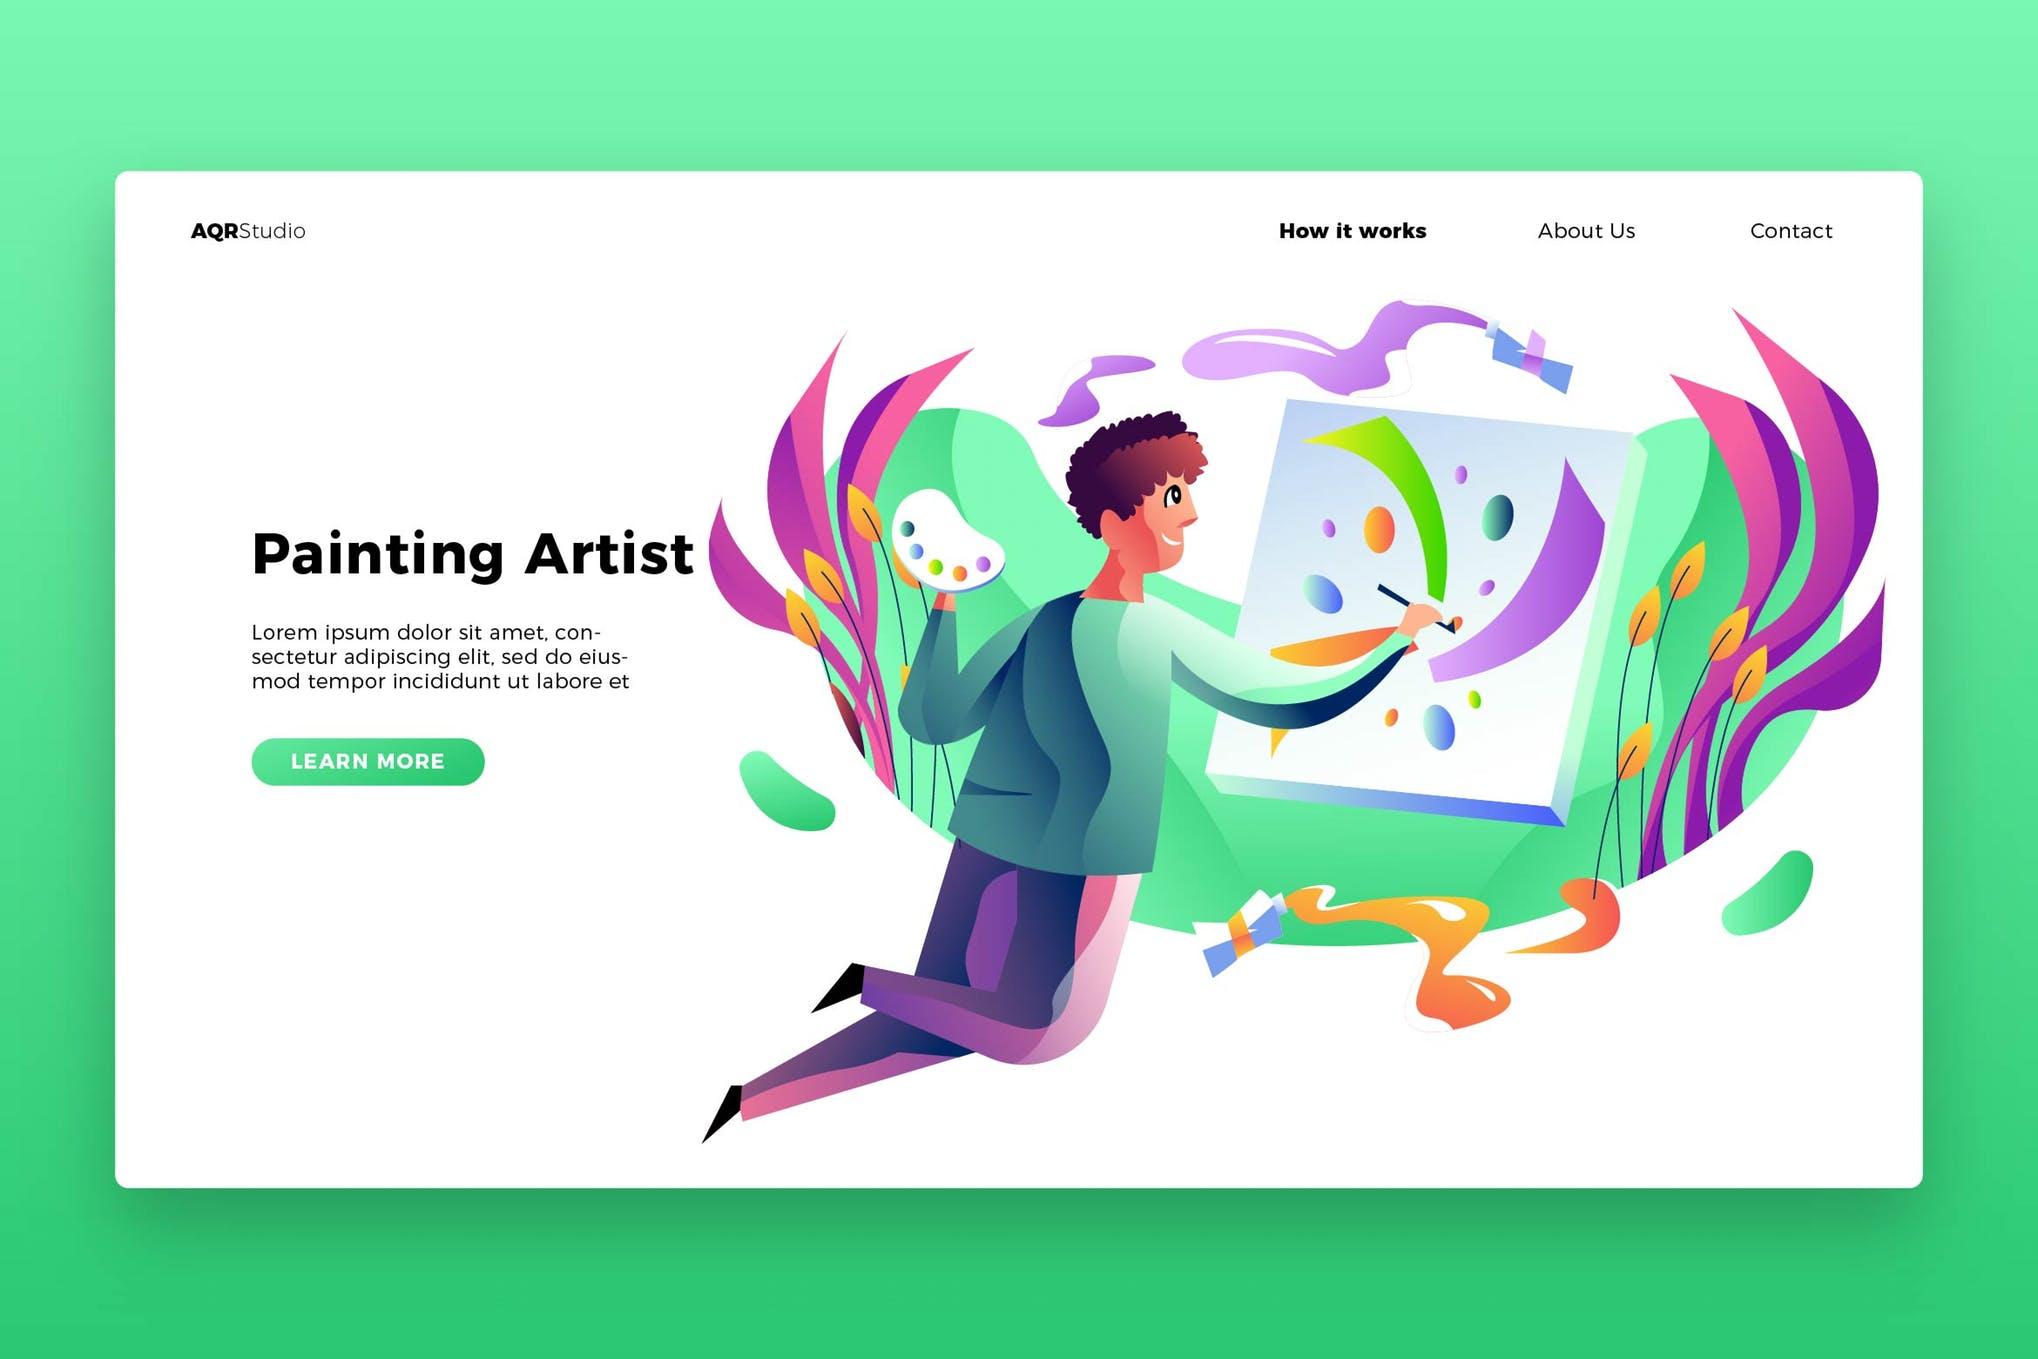 绘画场景素材模板展示效果图样机Paint Artist - Banner & Landing Page